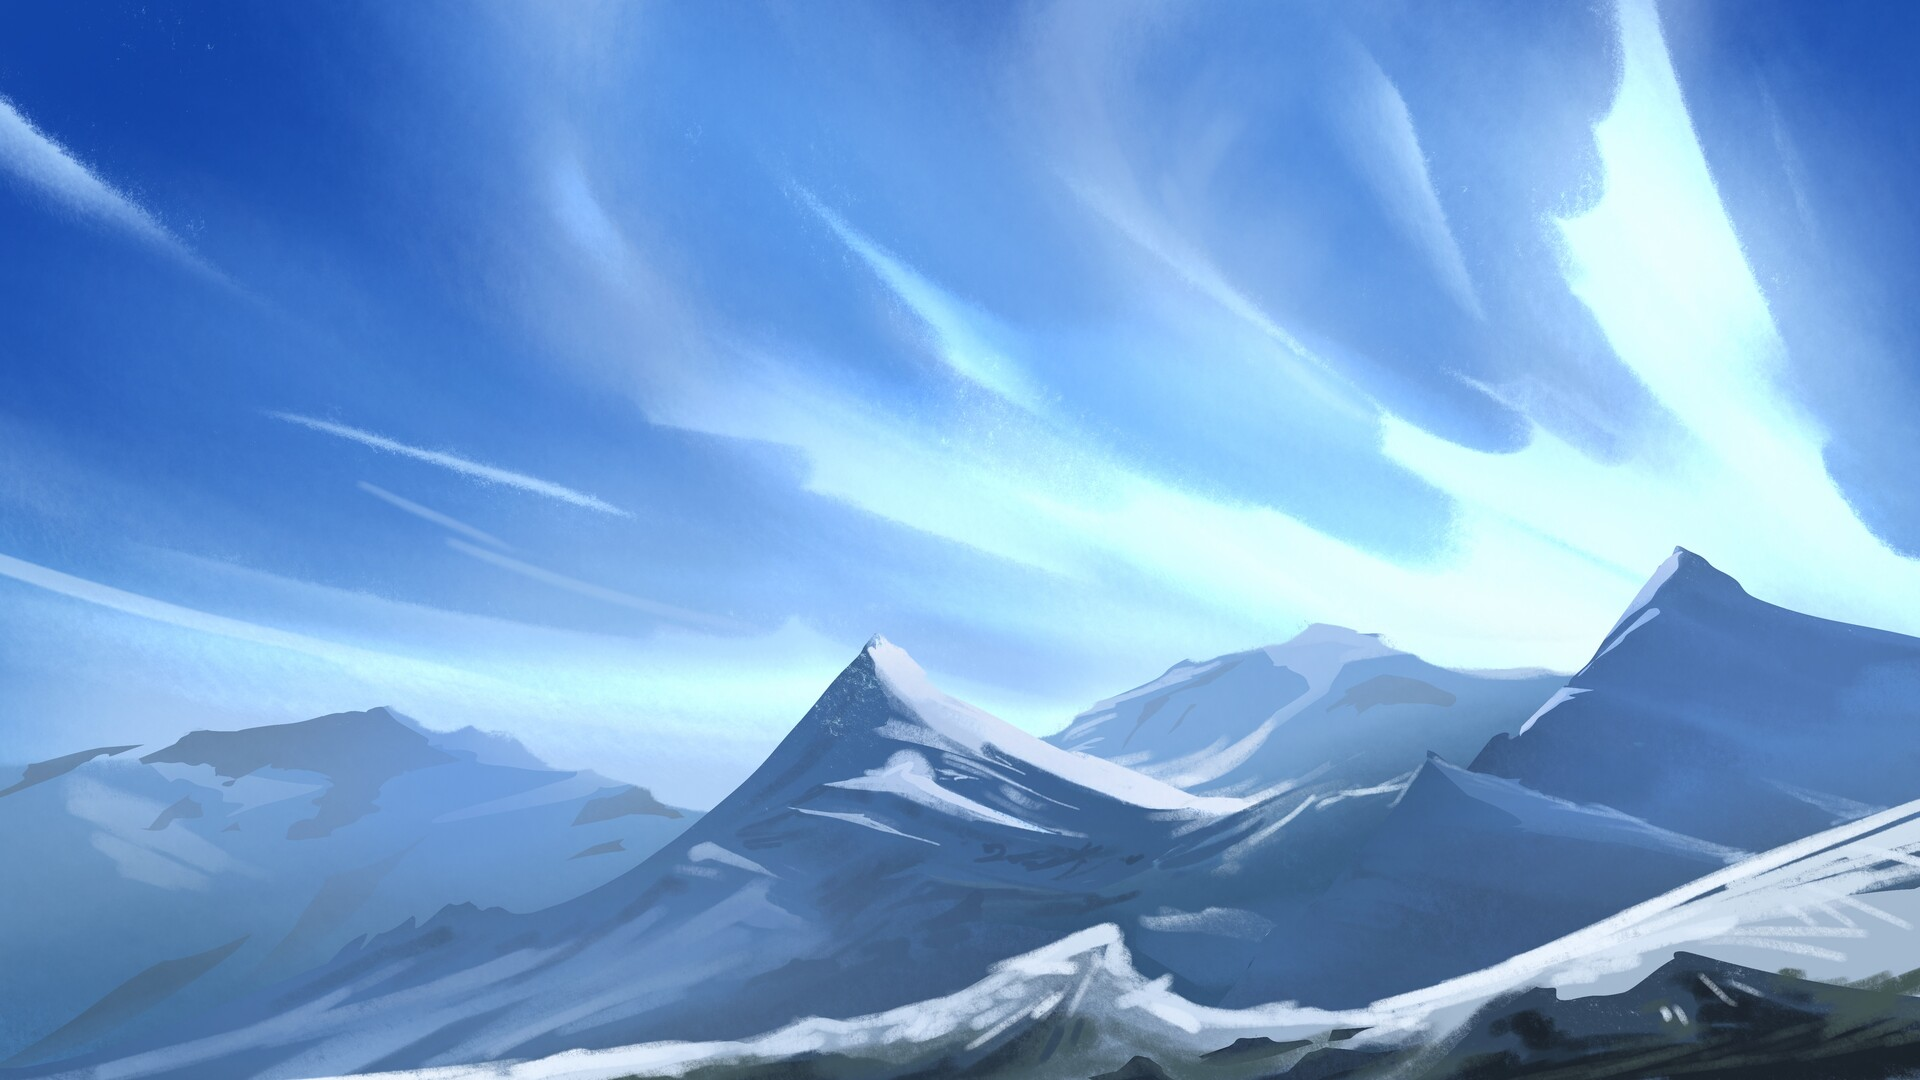 General 1920x1080 Ingram Schell artwork mountains snow sky